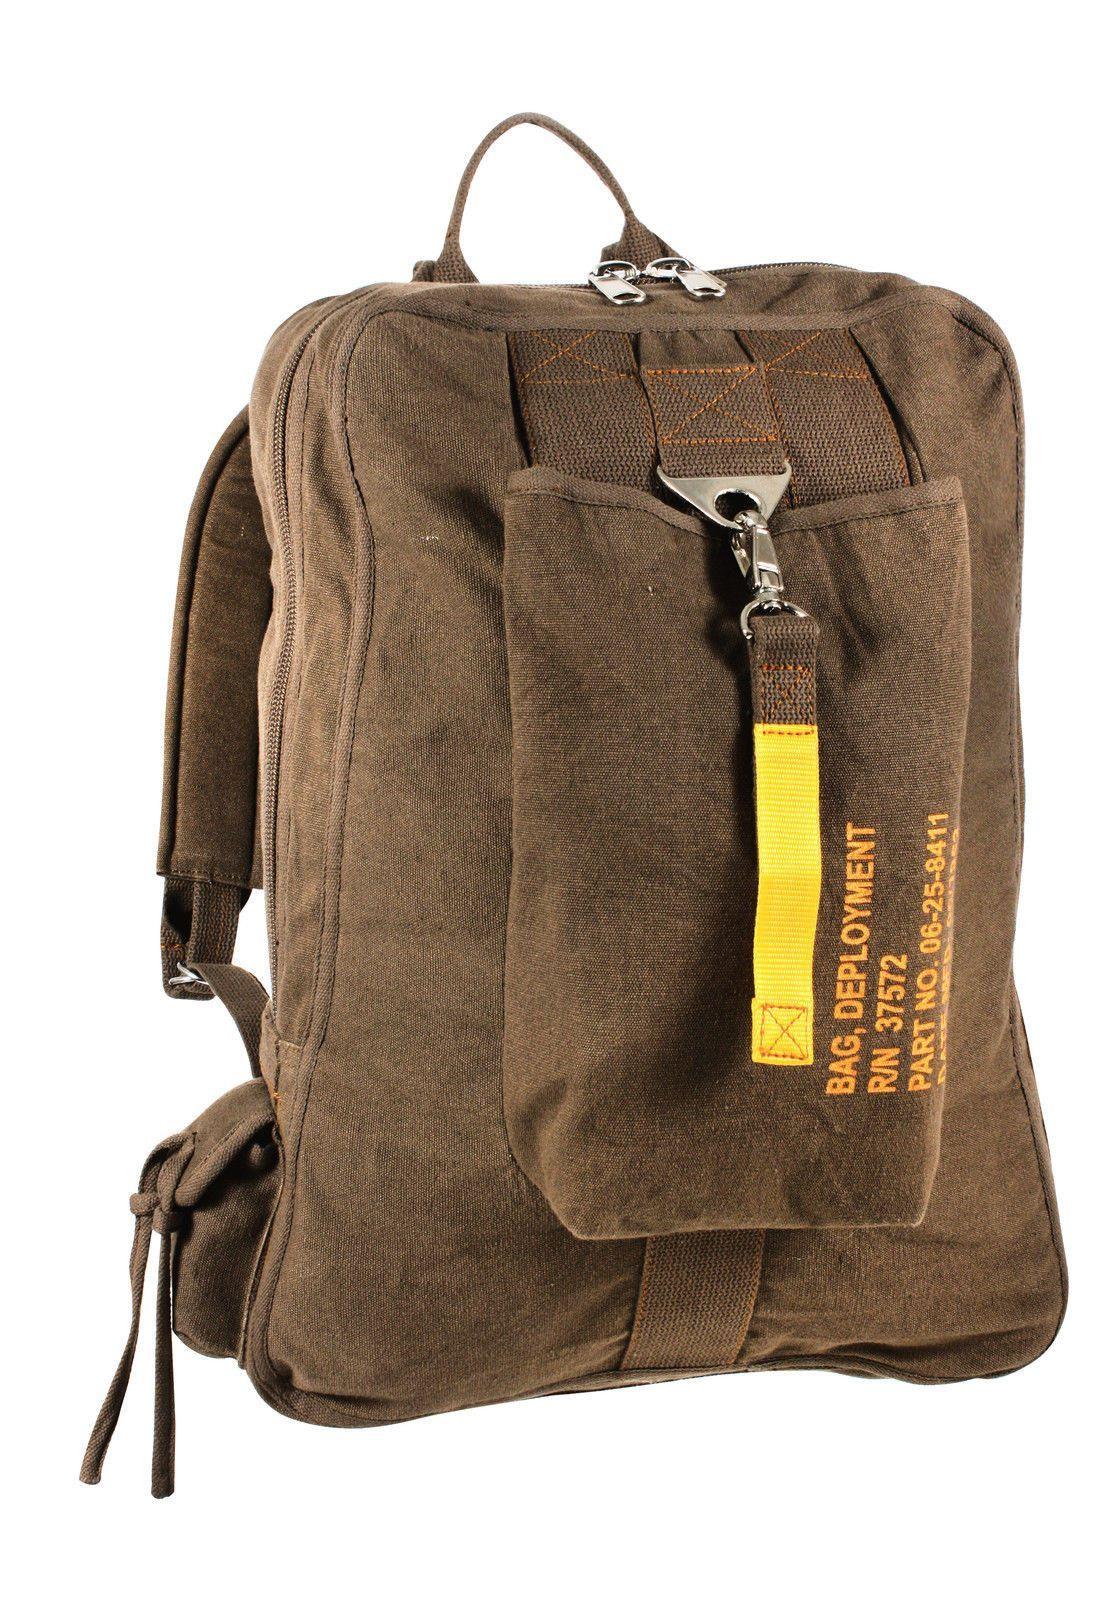 Vintage Canvas Flight Bags - Military Aviator Backpack Knapsack School Bag 79467ecbdcd61